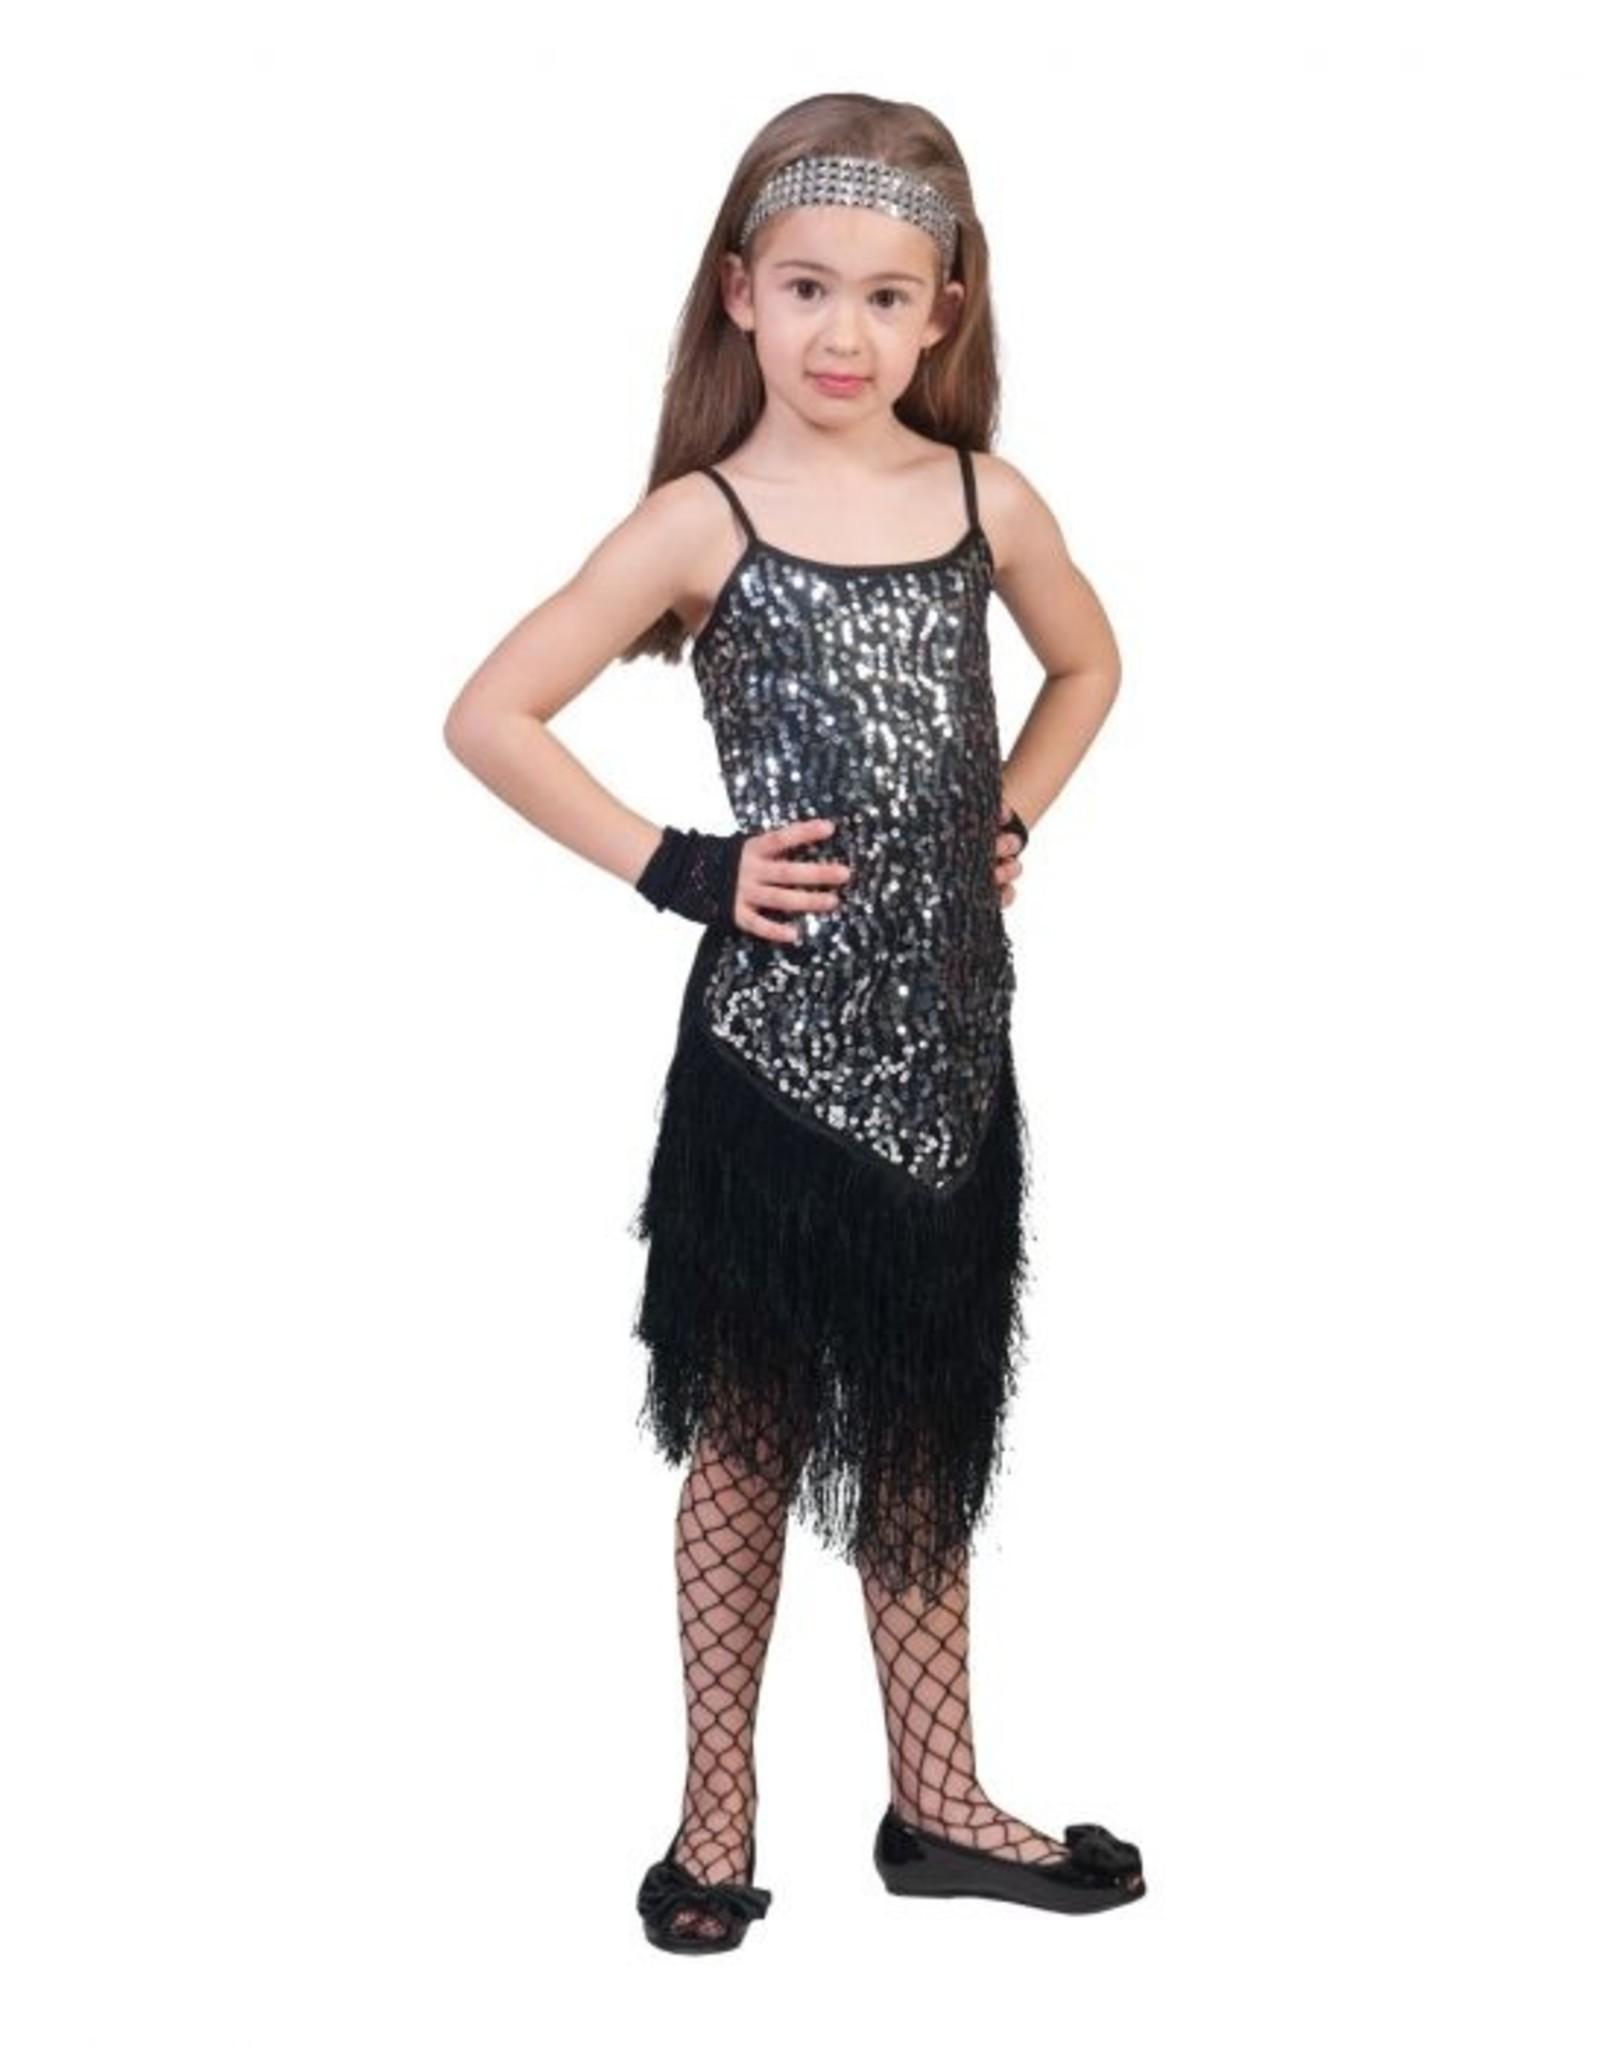 Funny Fashion Charleston jurk glamour glitter zilver kind